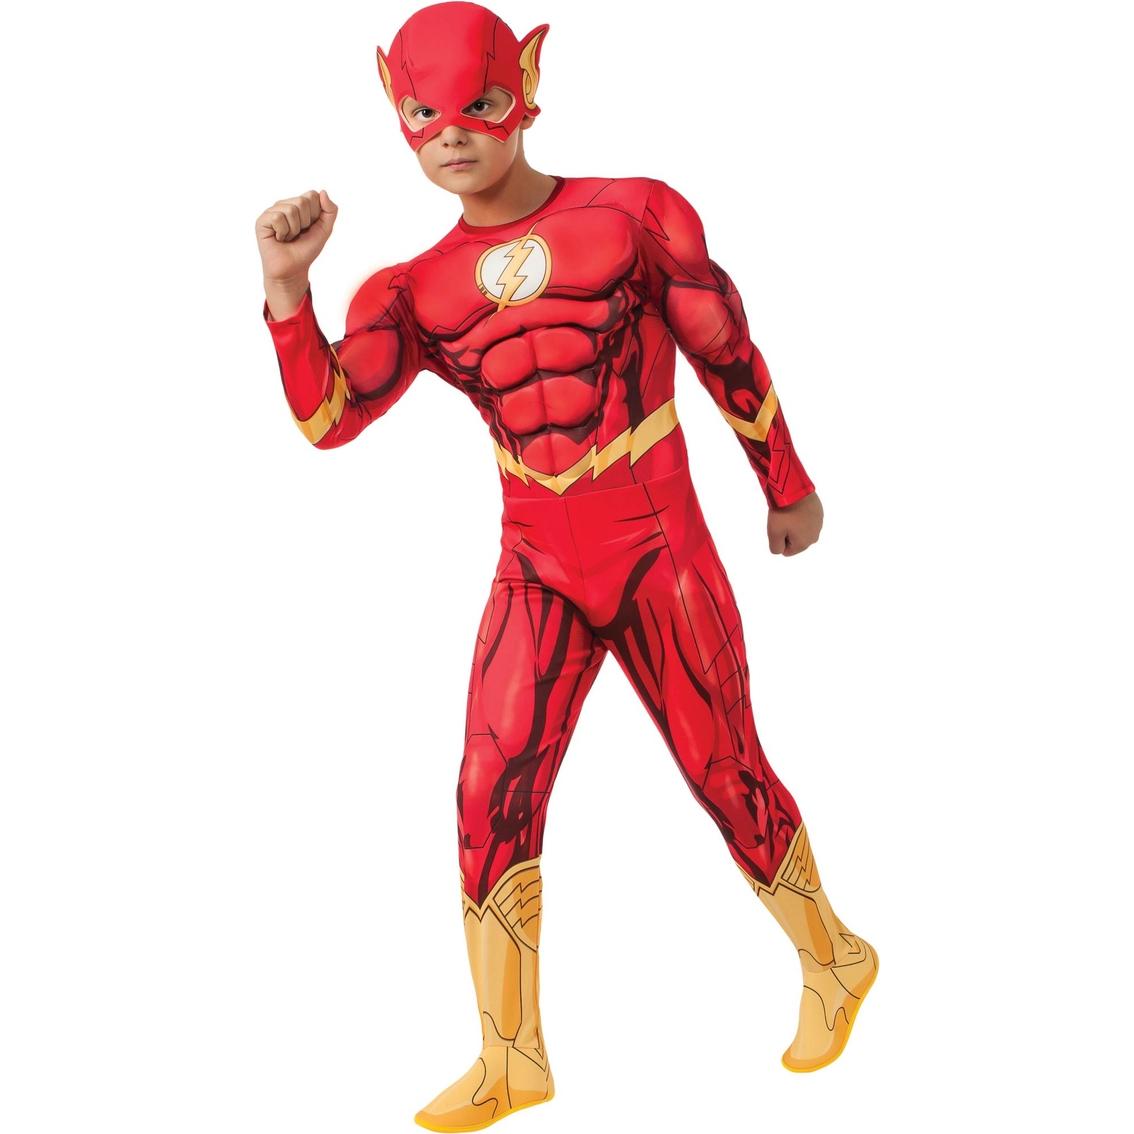 Amazing Rubieu0027s Costume Boys The Flash 3D Print Costume